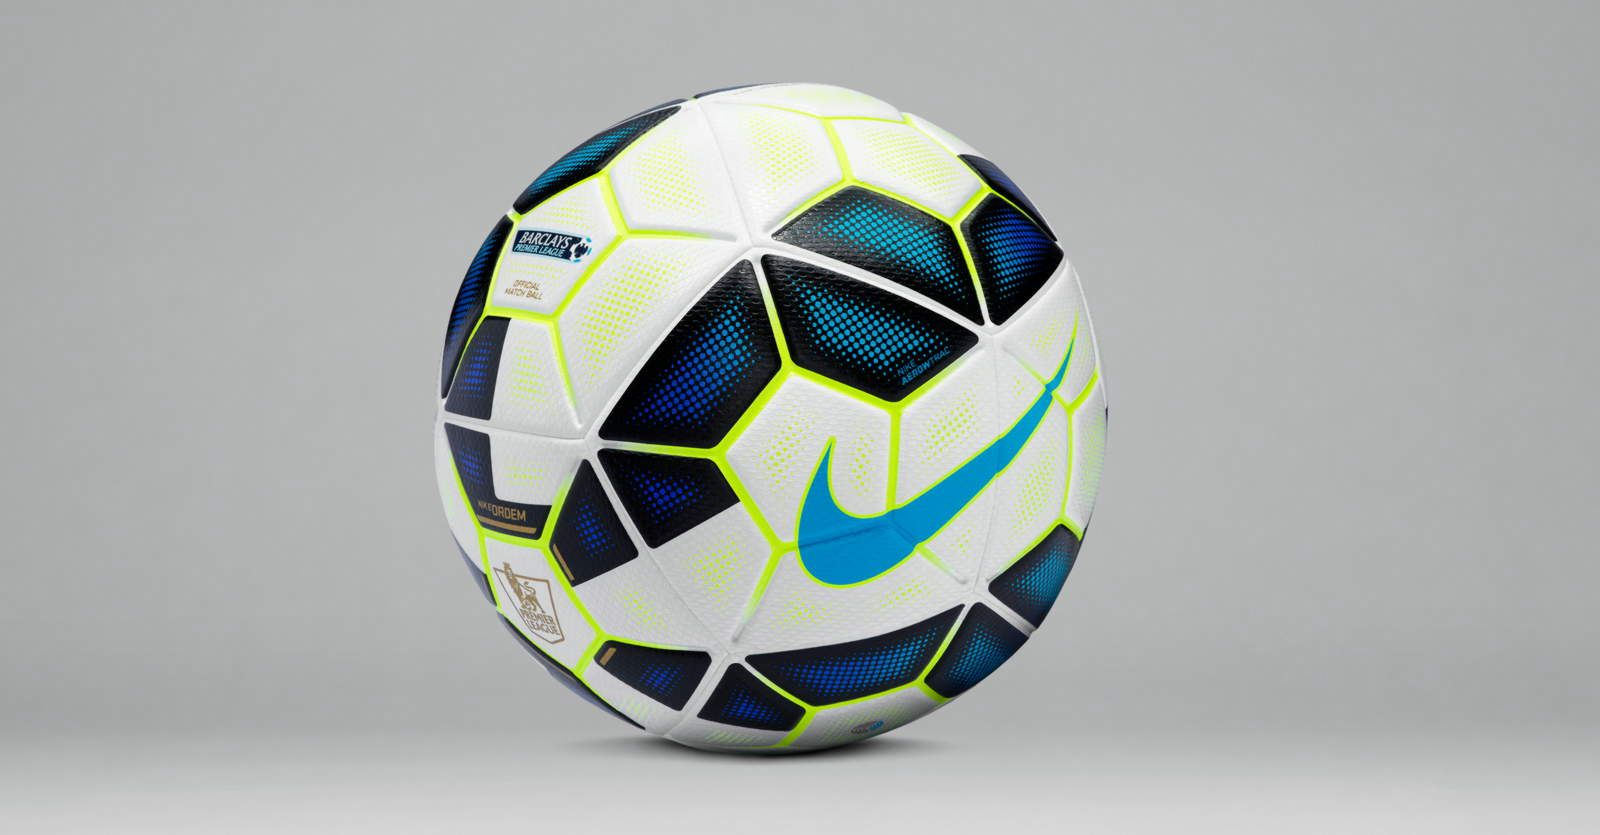 Premier League Match Day Football  d3ad30a71